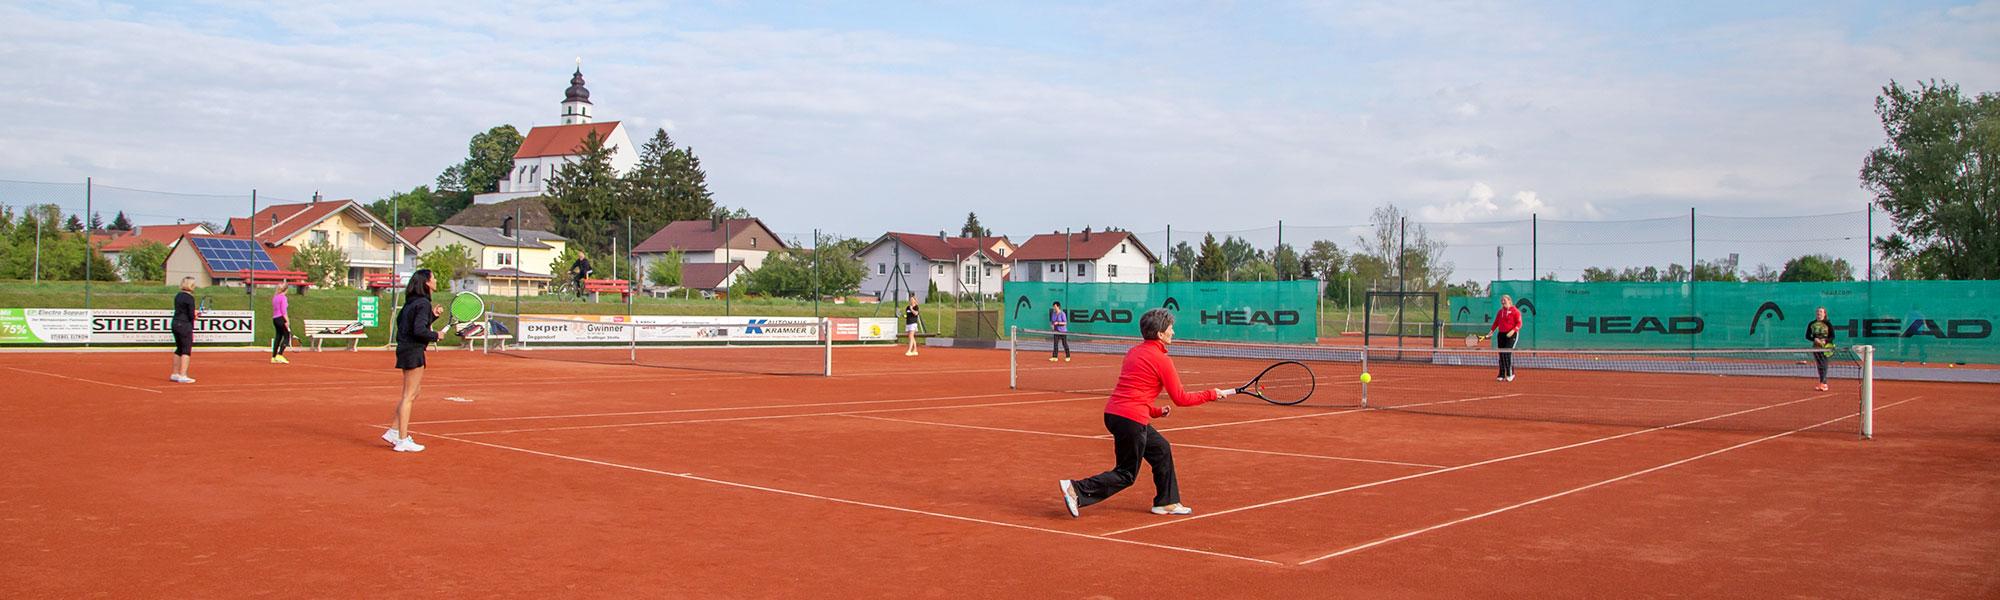 Freizeitsport - Tennisclub Hengersberg